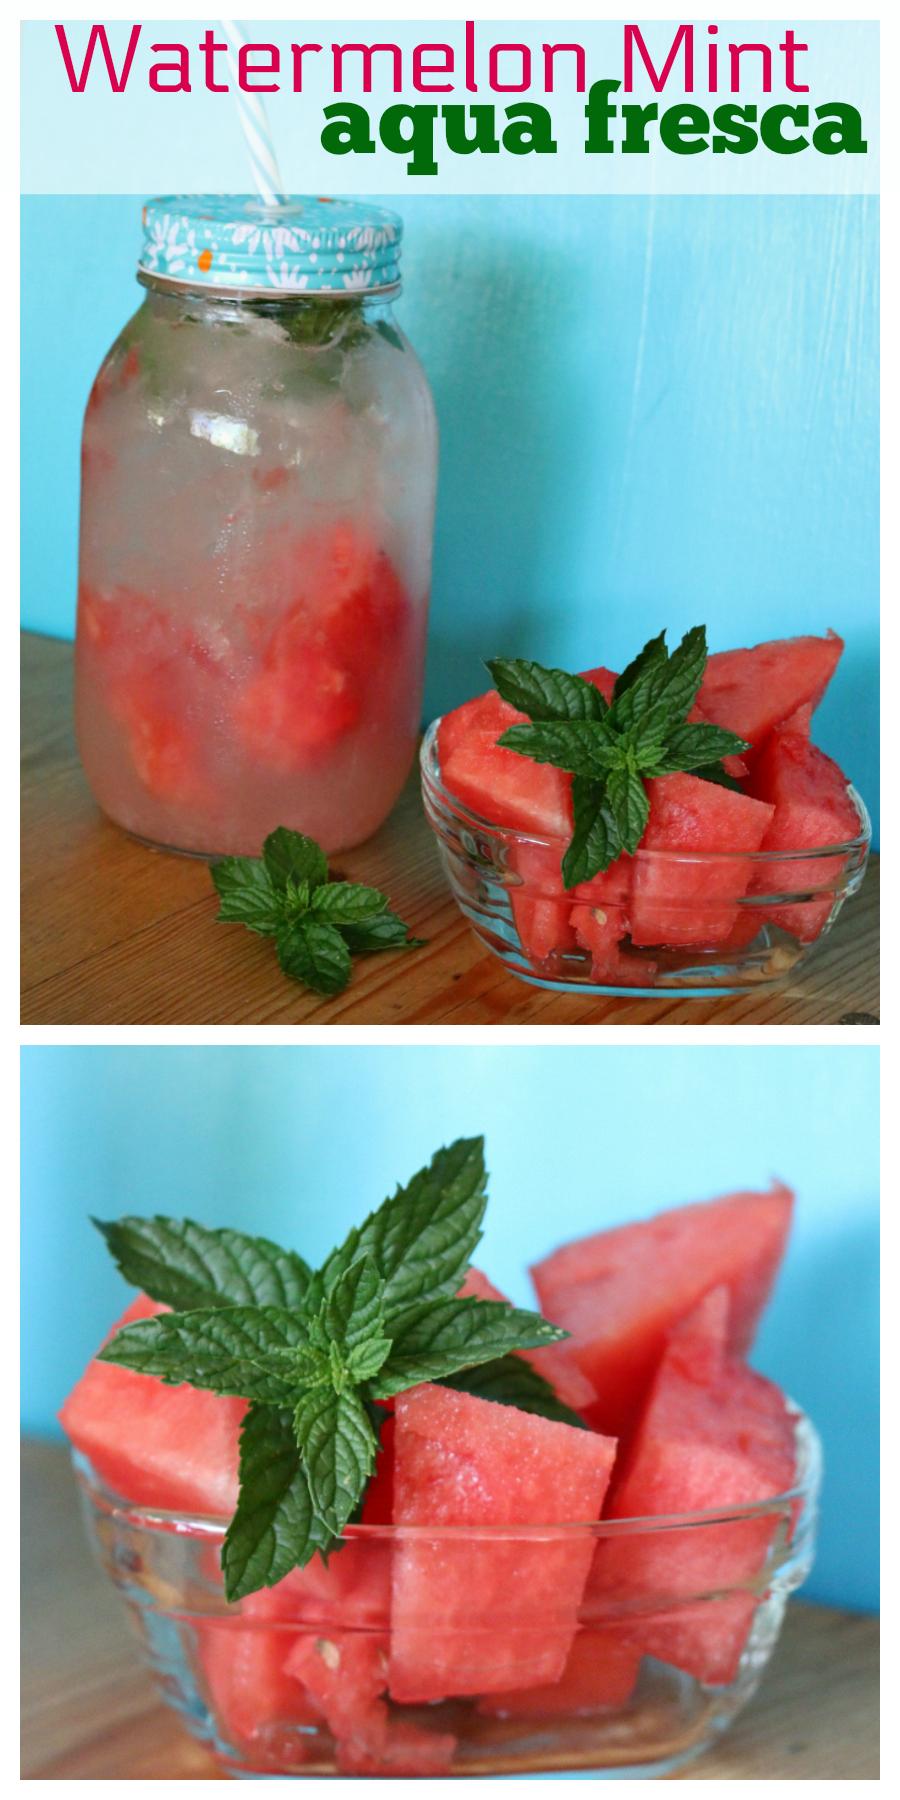 Watermelon Mint Aqua Fresca - a great alternative to soda. | CeceliasGoodStuff.com - Good Food for Good People |